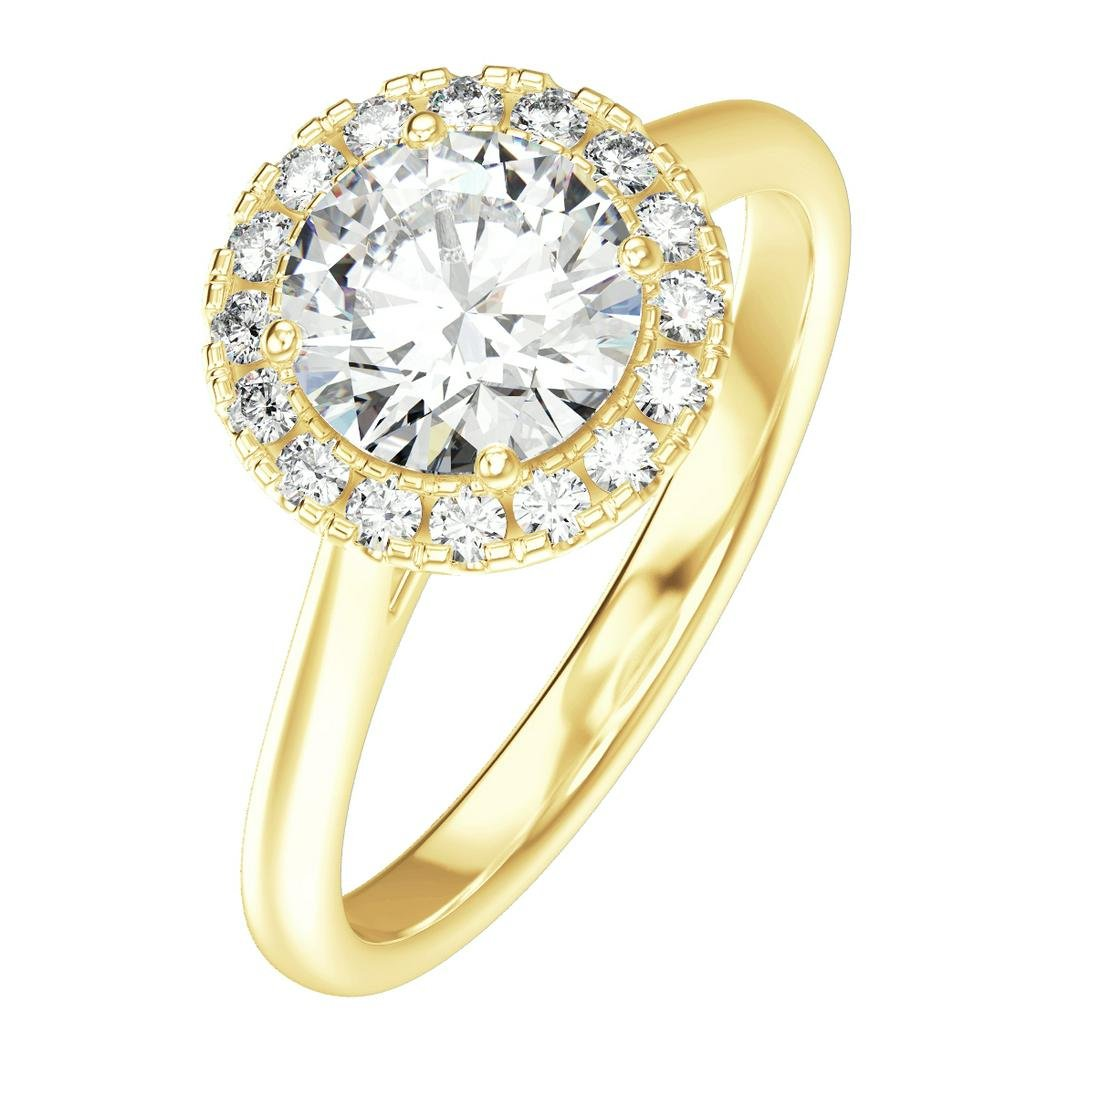 1.74 Carat Halo 18K Yellow Gold Engagement Ring